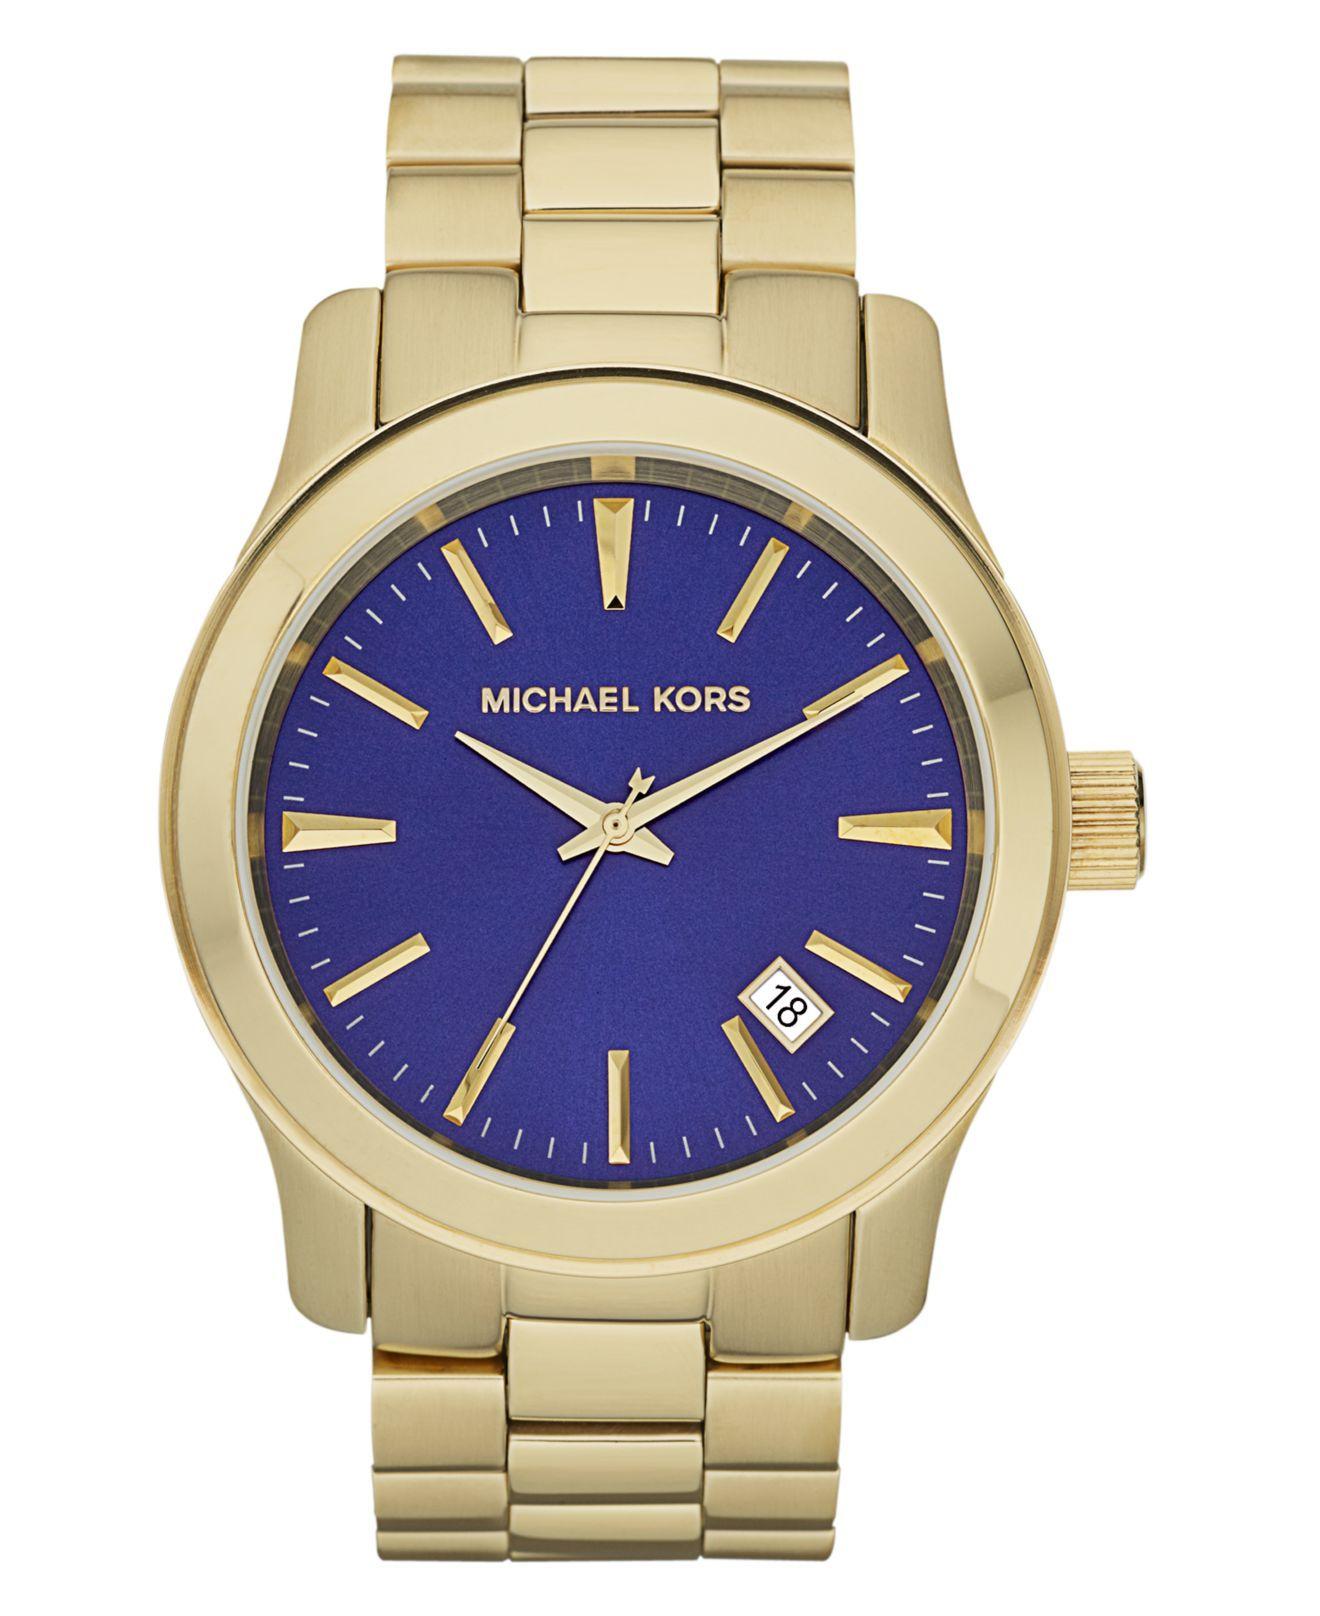 Michael Kors Watch, Men\u0027s Runway Gold Tone Stainless Steel Bracelet 45mm  MK7049 - For Him